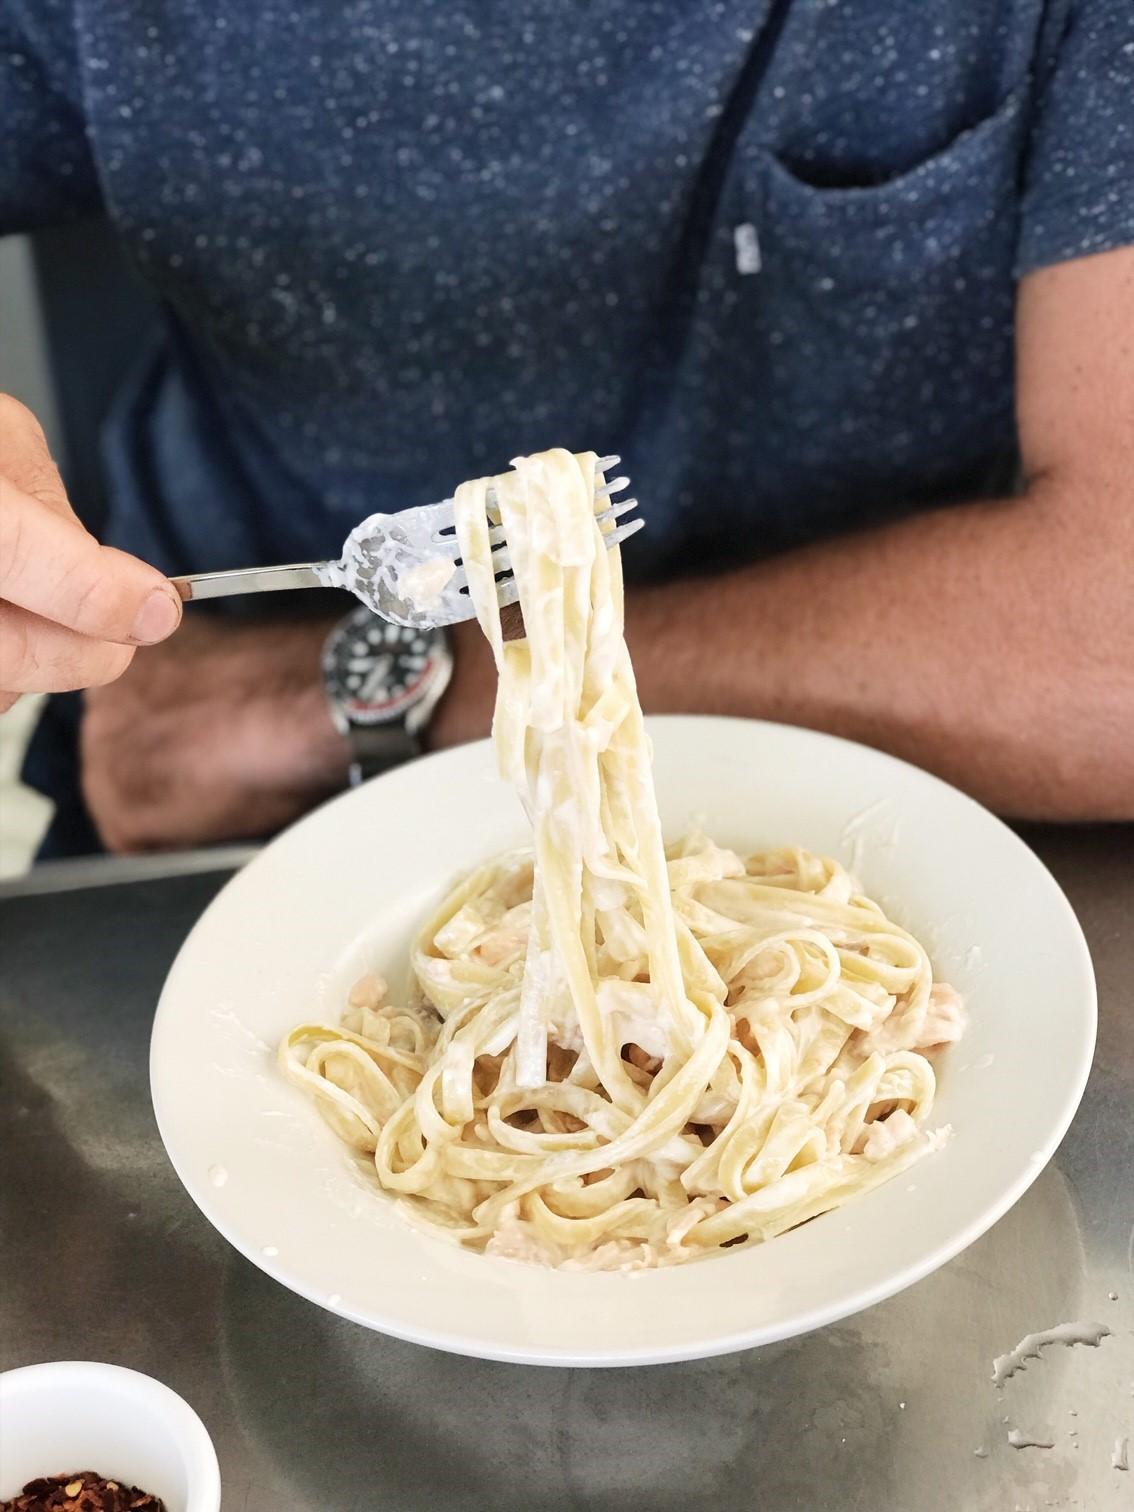 Where to go in Road Town - Fresh Pasta at Capriccio's